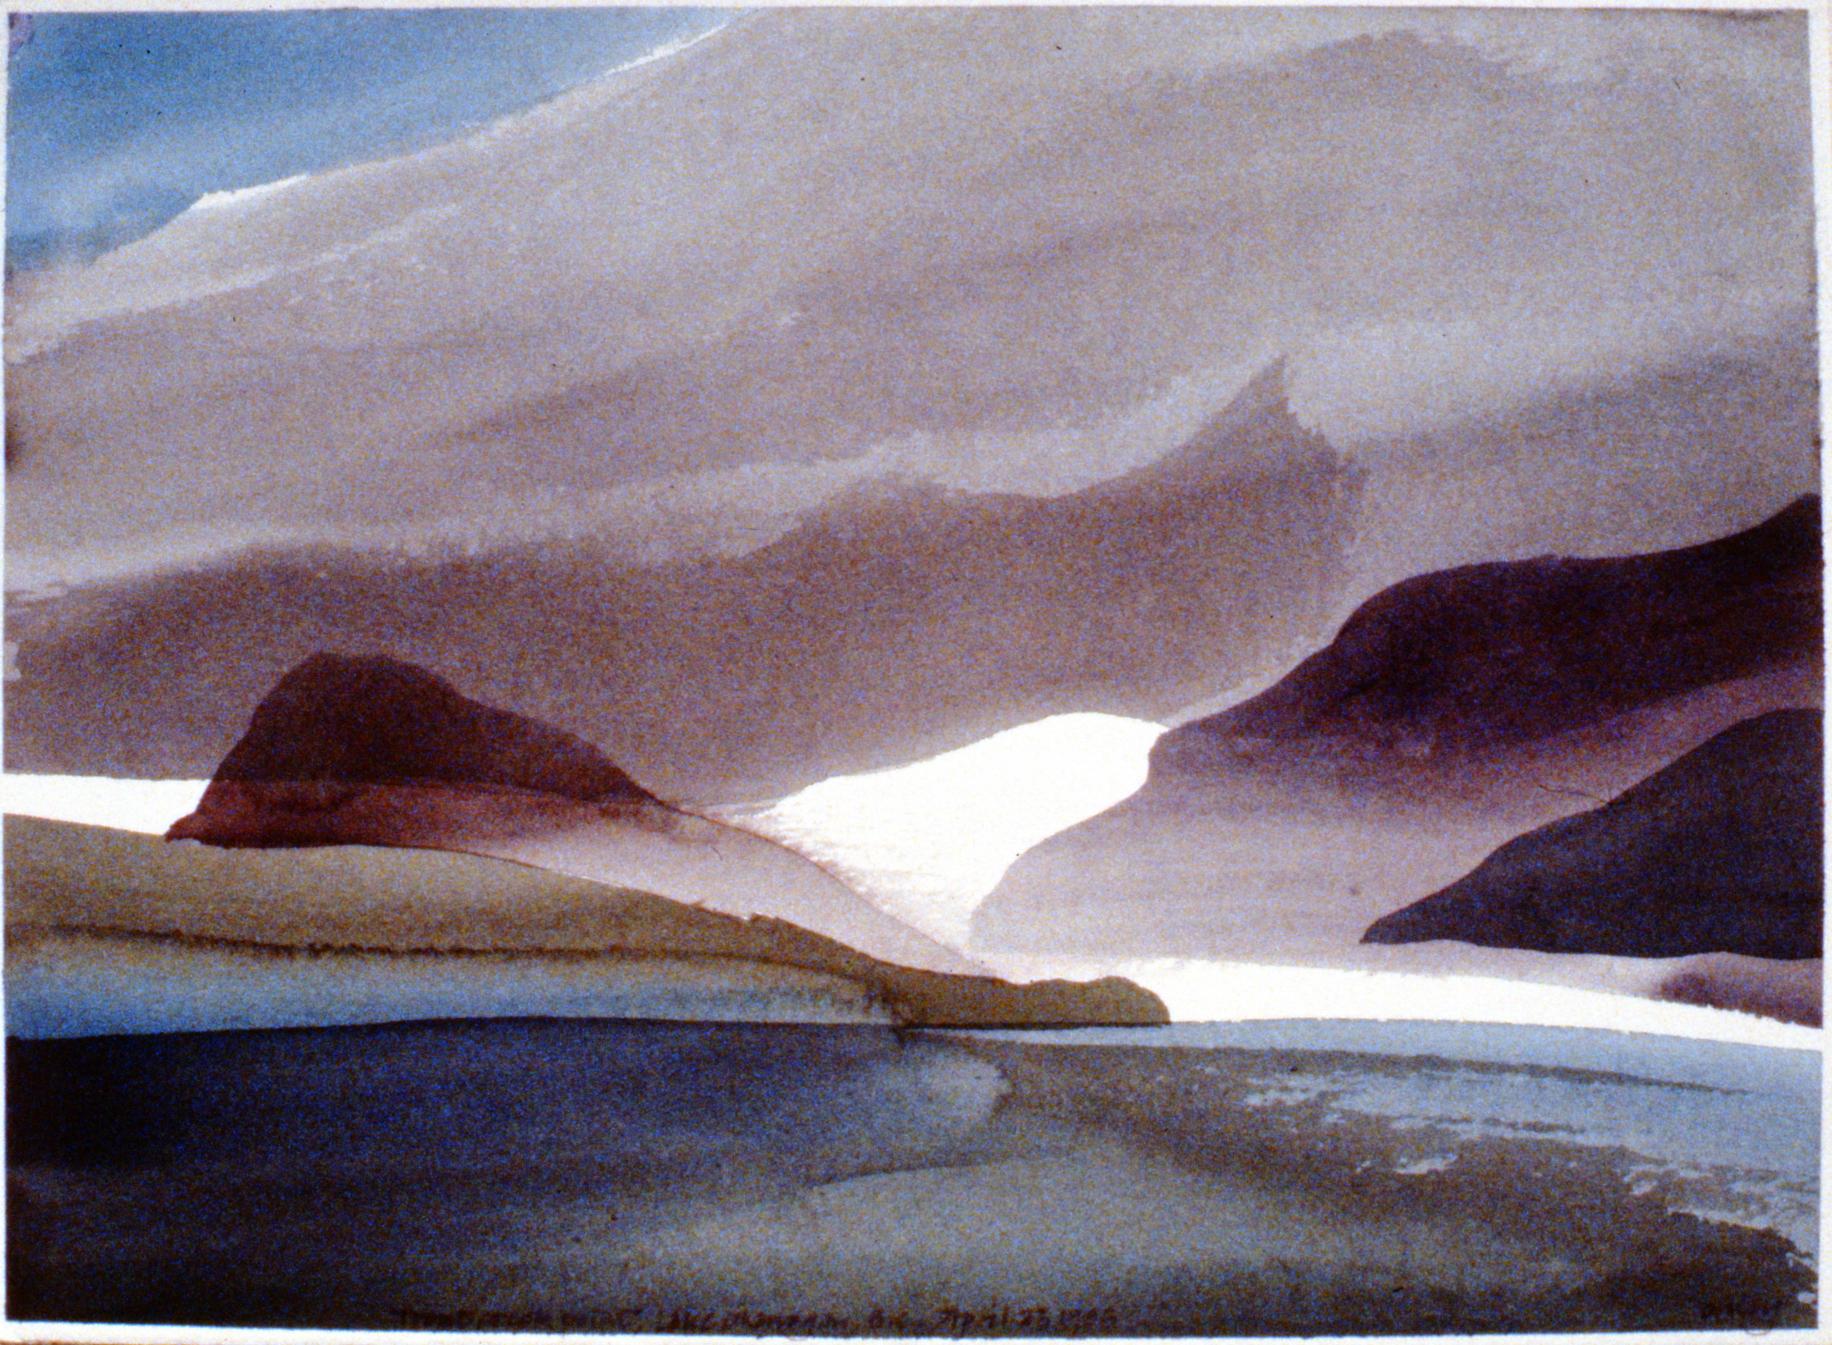 Trout Creek Point, Lake Okanagan , April 23, 1985, Toni Onley, watercolour on paper, 27.2 x 37.7 cm,1994.15.07. Gift of the artist.